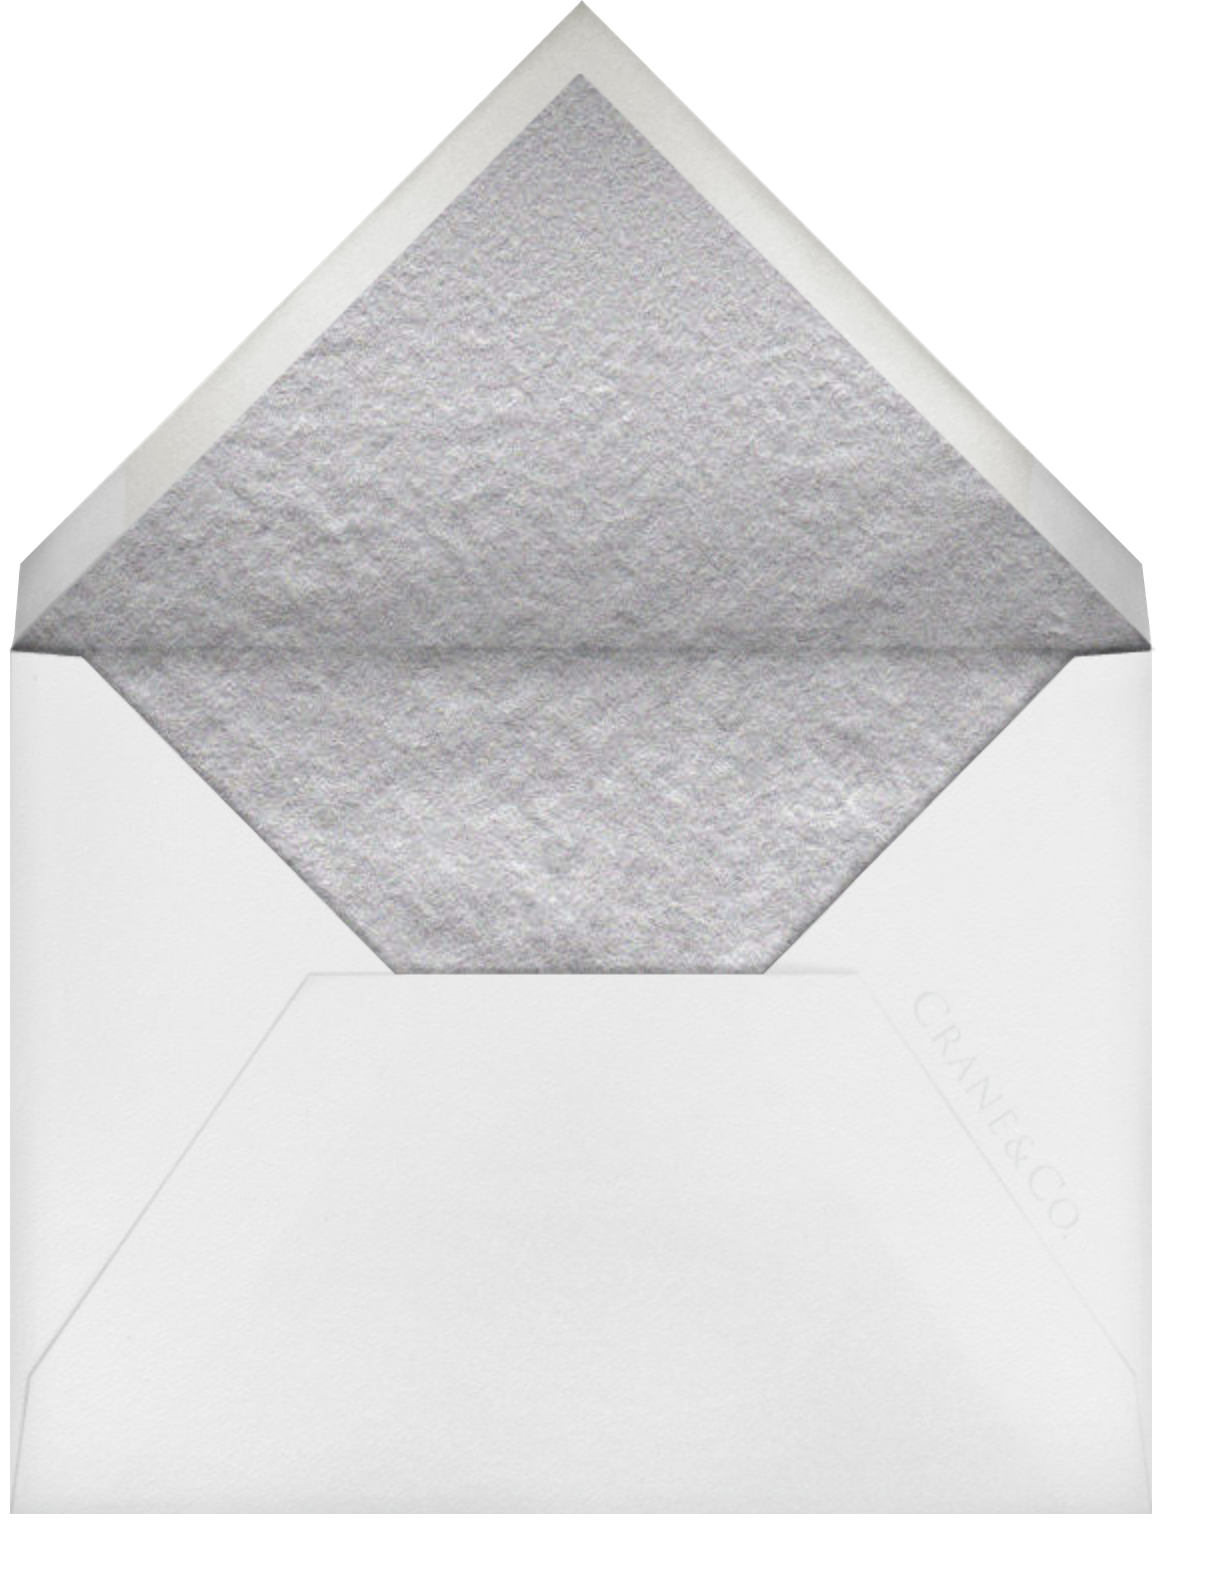 Commerce Street (Save The Date) - Platinum - Crane & Co. - null - envelope back